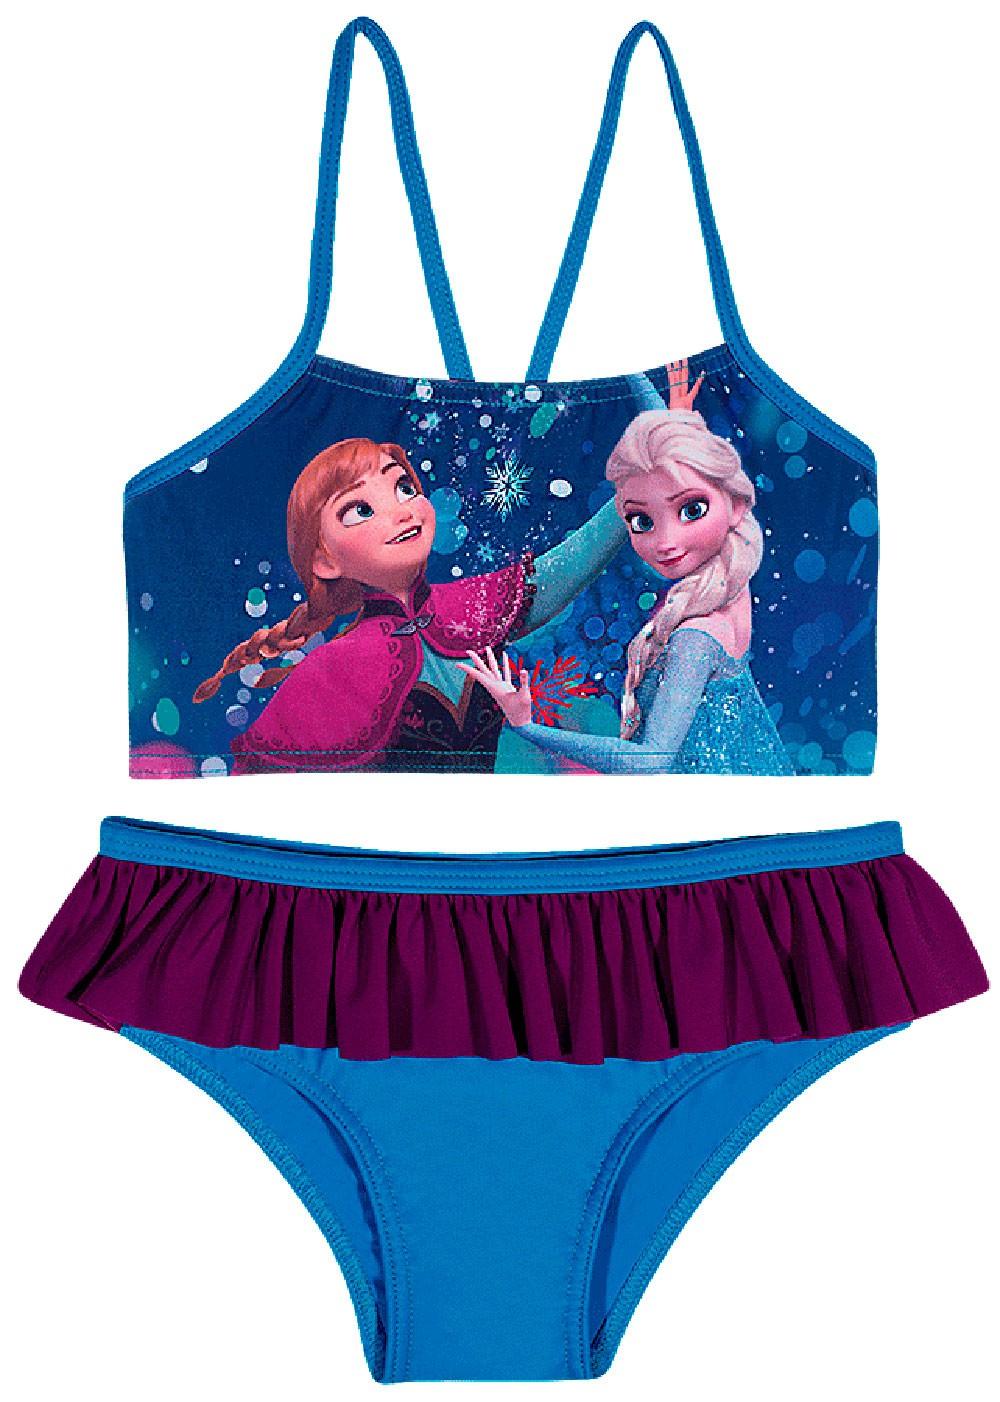 Biquini Infantil Verão Azul Frozen Tip Top